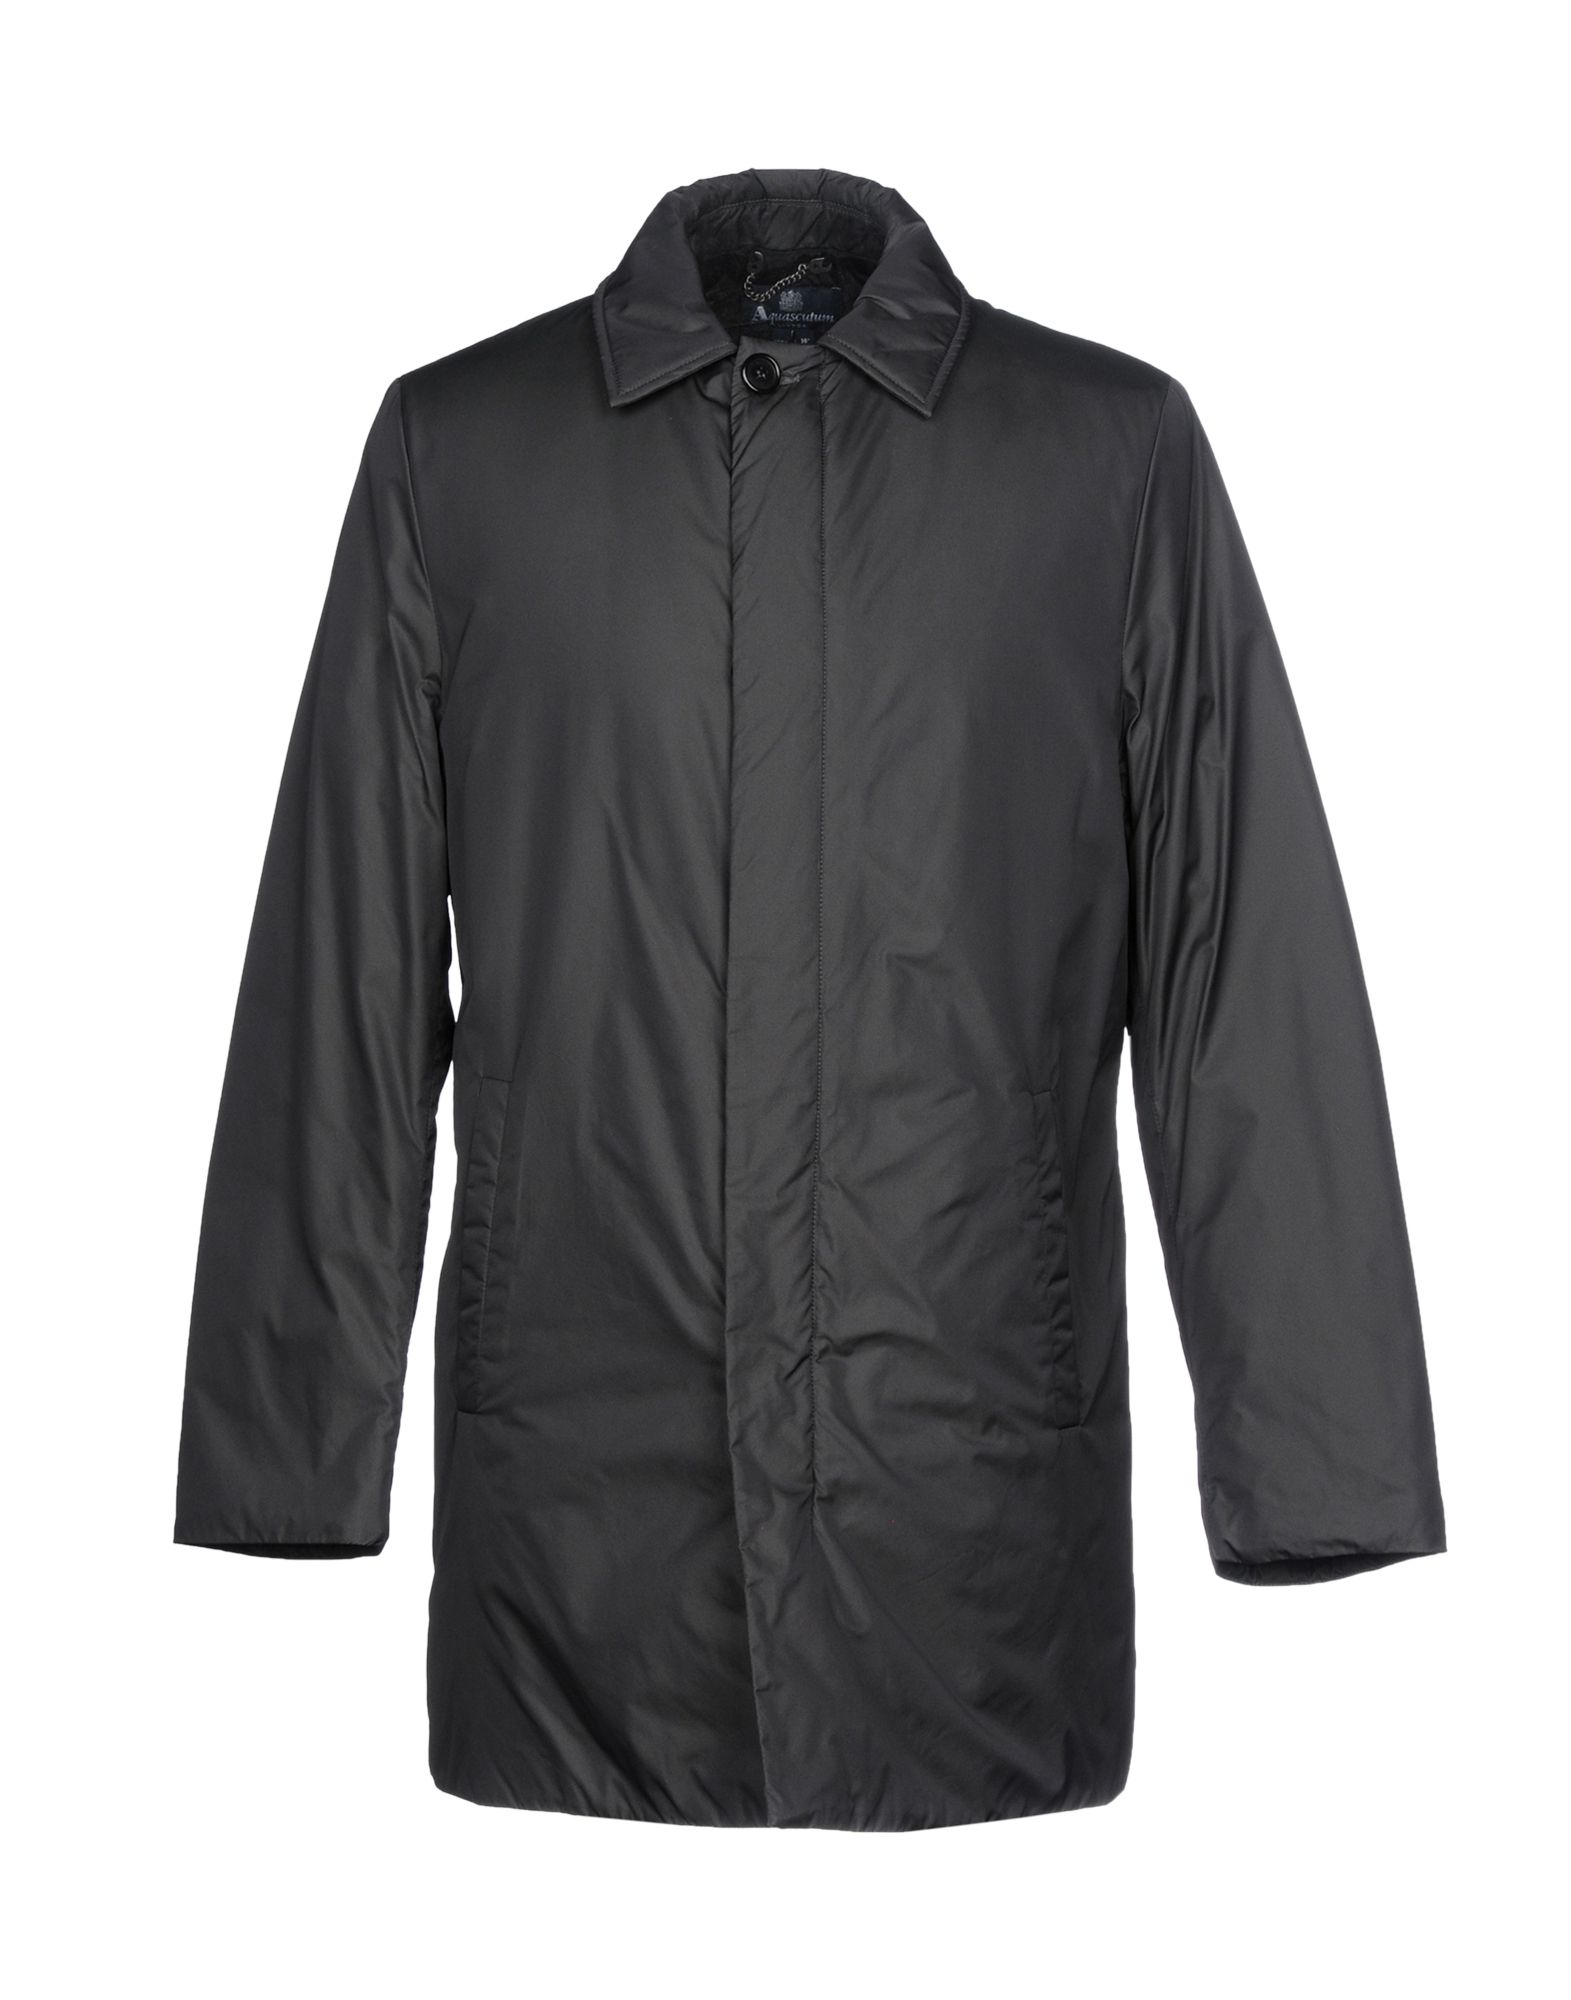 AQUASCUTUM Jacket in Lead